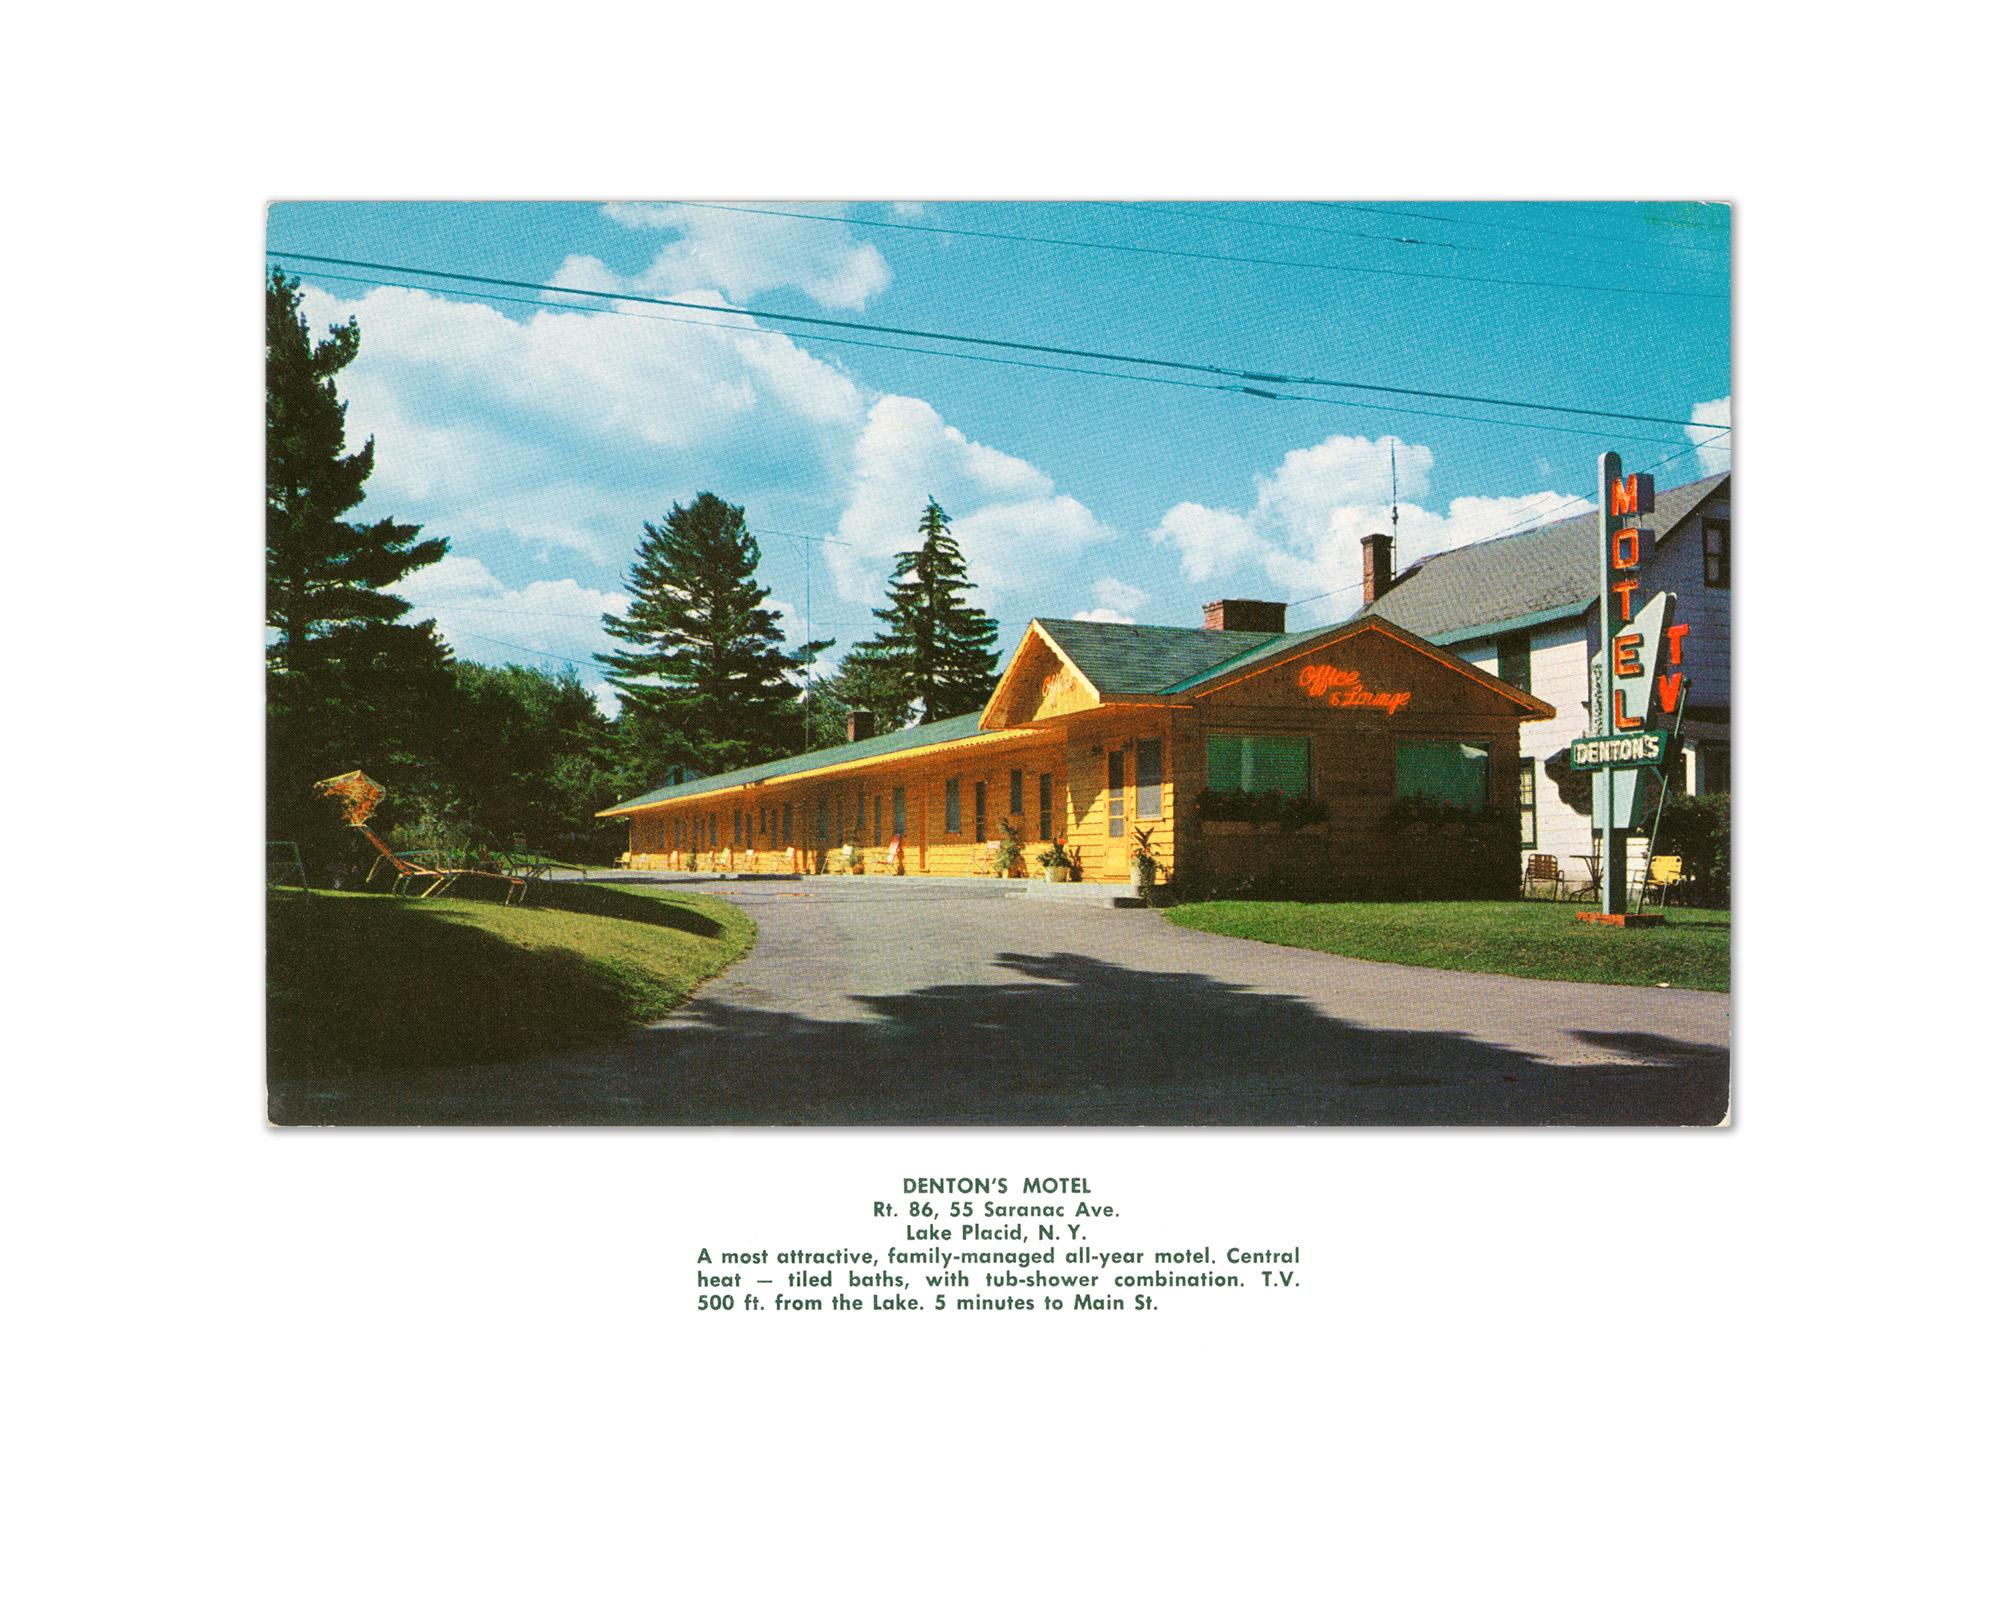 Maple_Leaf_Inn_formerly_Denton's_Motel_Lake_Placid_postcard.jpg